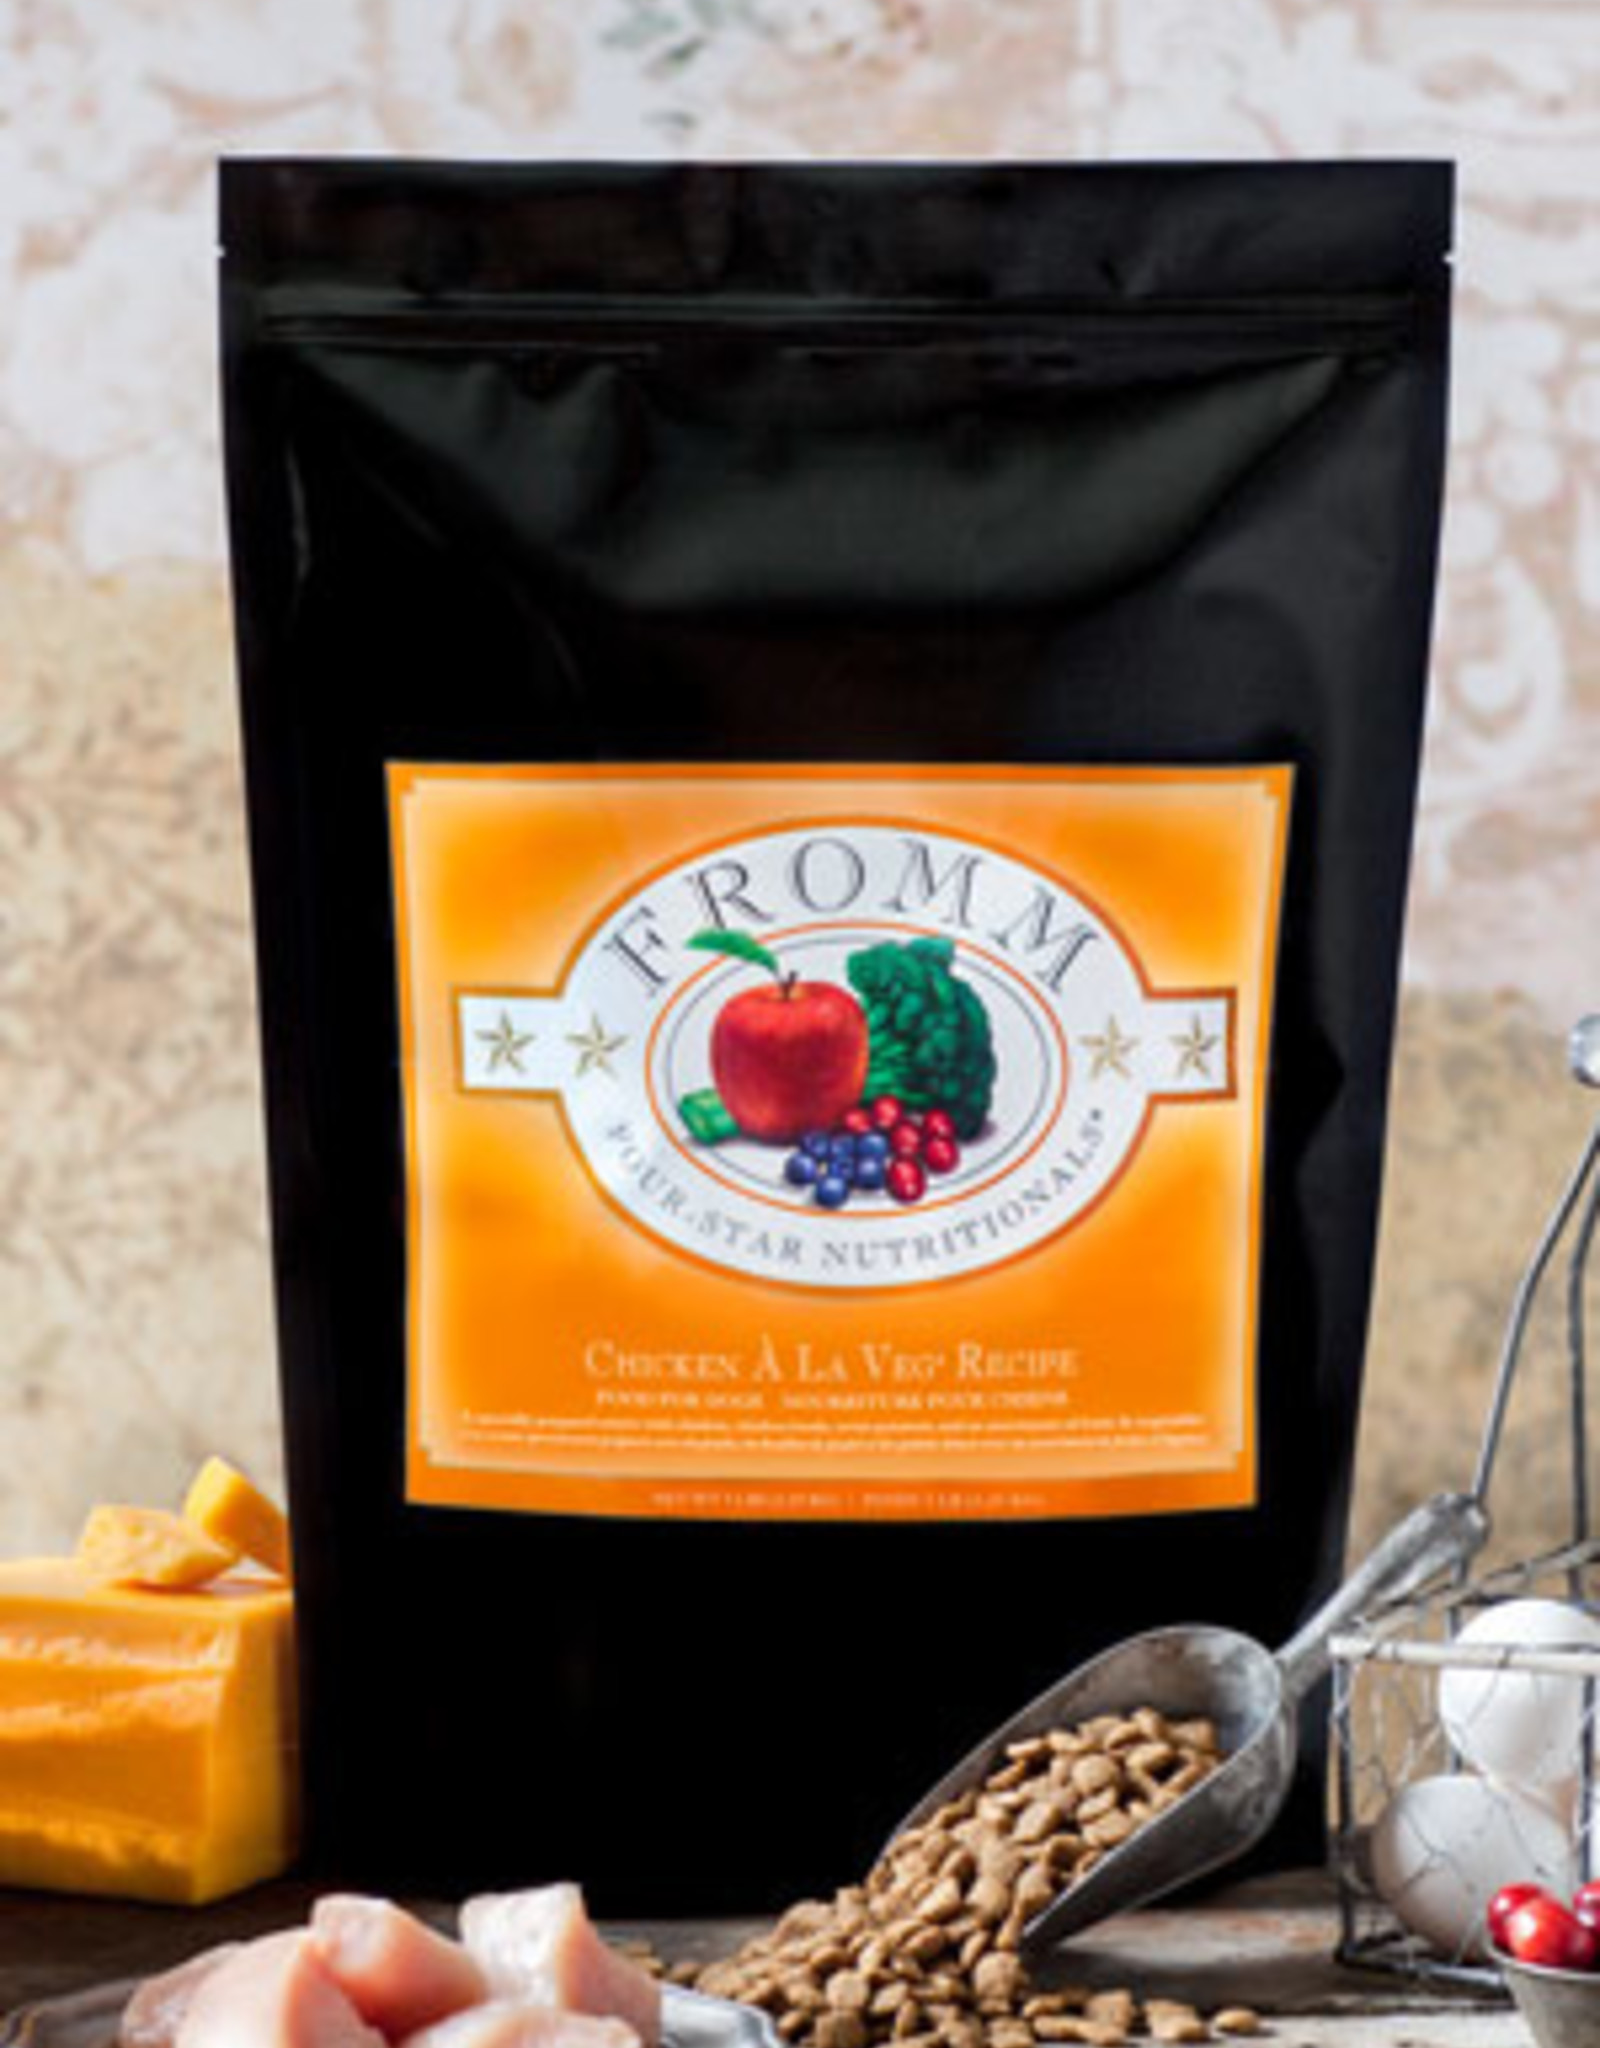 Fromm Family Pet Foods Whole Grain Chicken À La Veg® Recipe